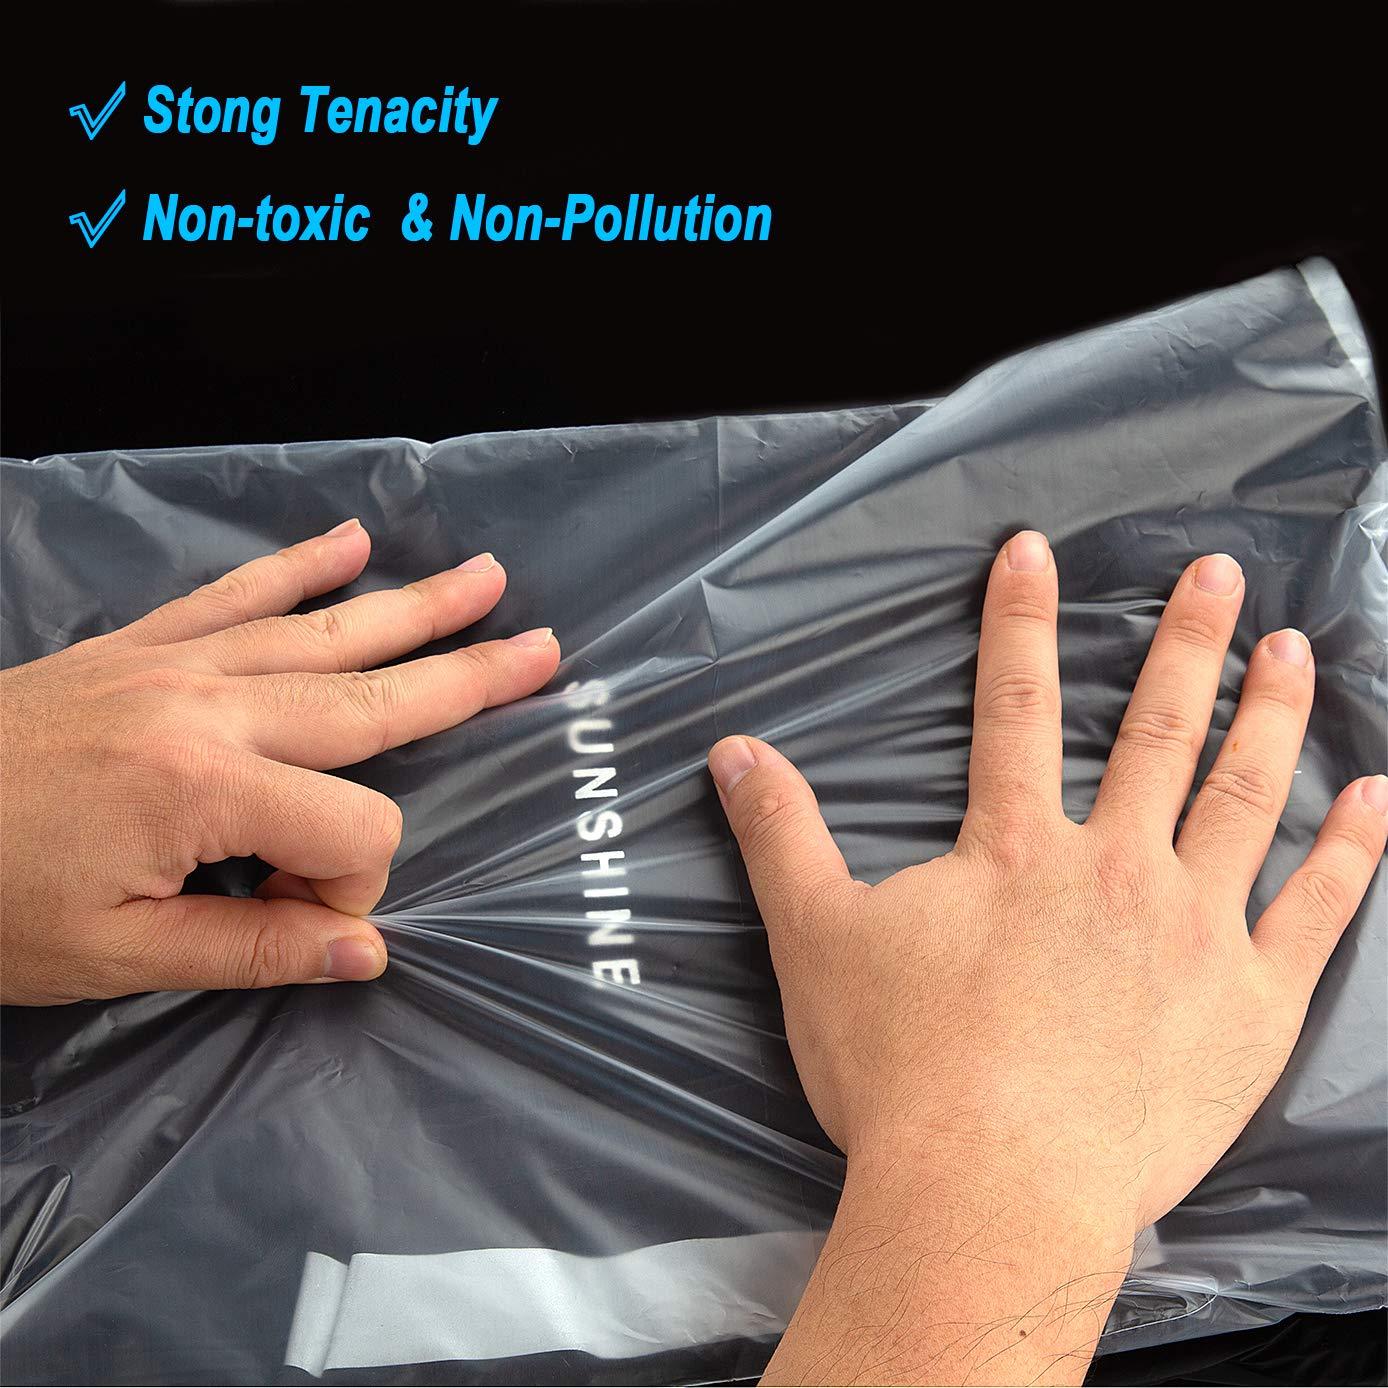 Brochure Letter Size Documents Plastic Cellophane Cello Bags CenterZ 100 Count 9x12 Self Seal 2.76 Mil Matte Clear Poly Bags Translucent OPP Apparel Bag Set fits for Prints Photos T-shirt Clothes